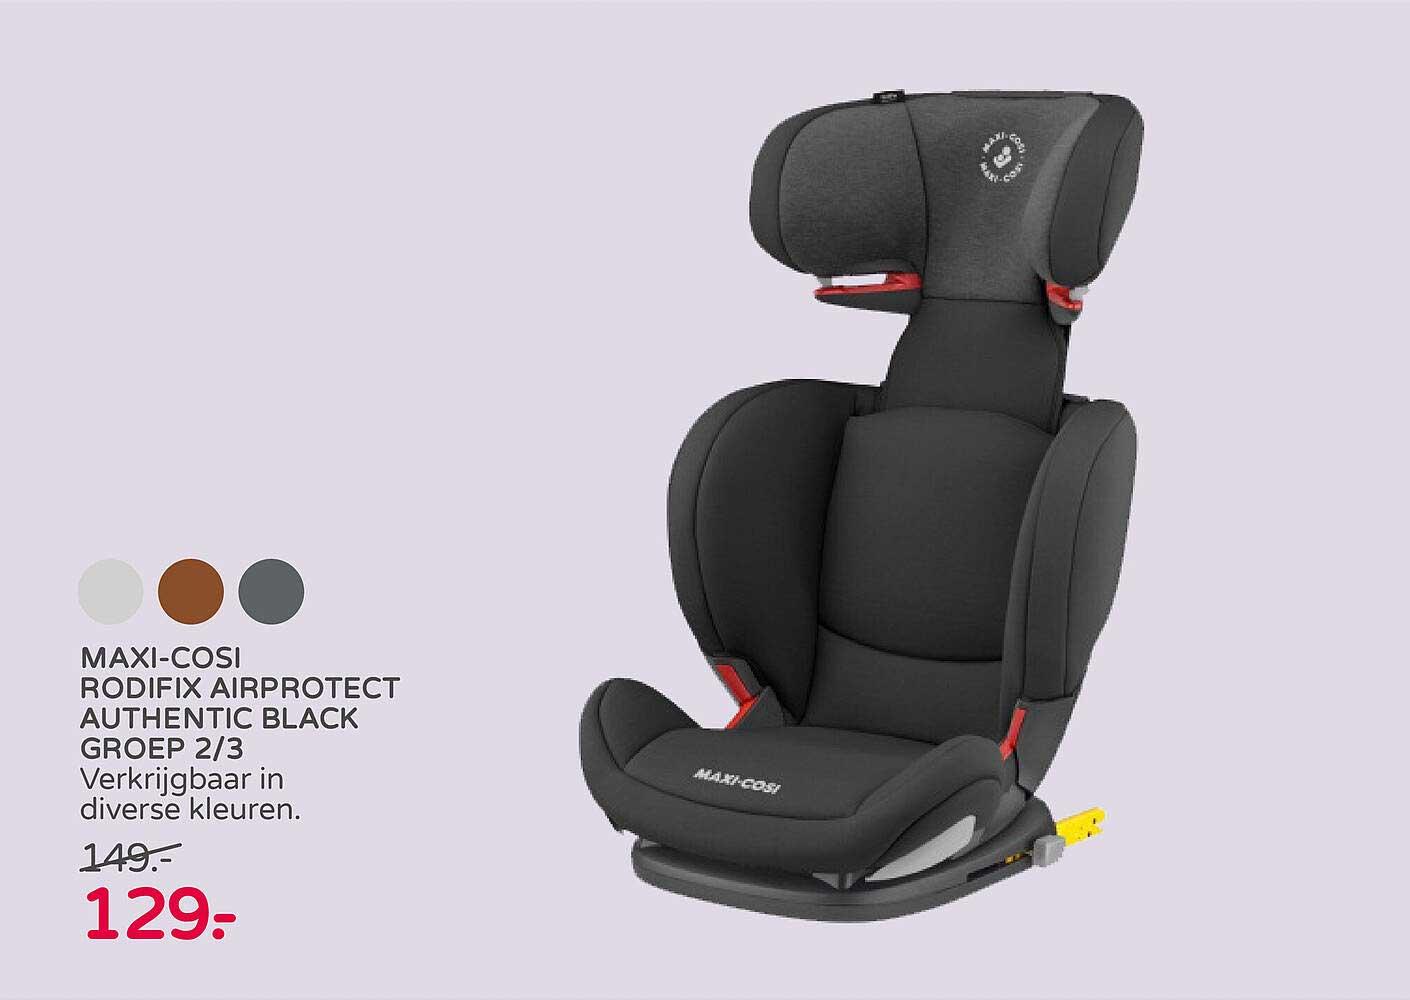 Prénatal Maxi-Cosi Rodifix Airprotect Authentic Black Groep 2-3 Autostoel